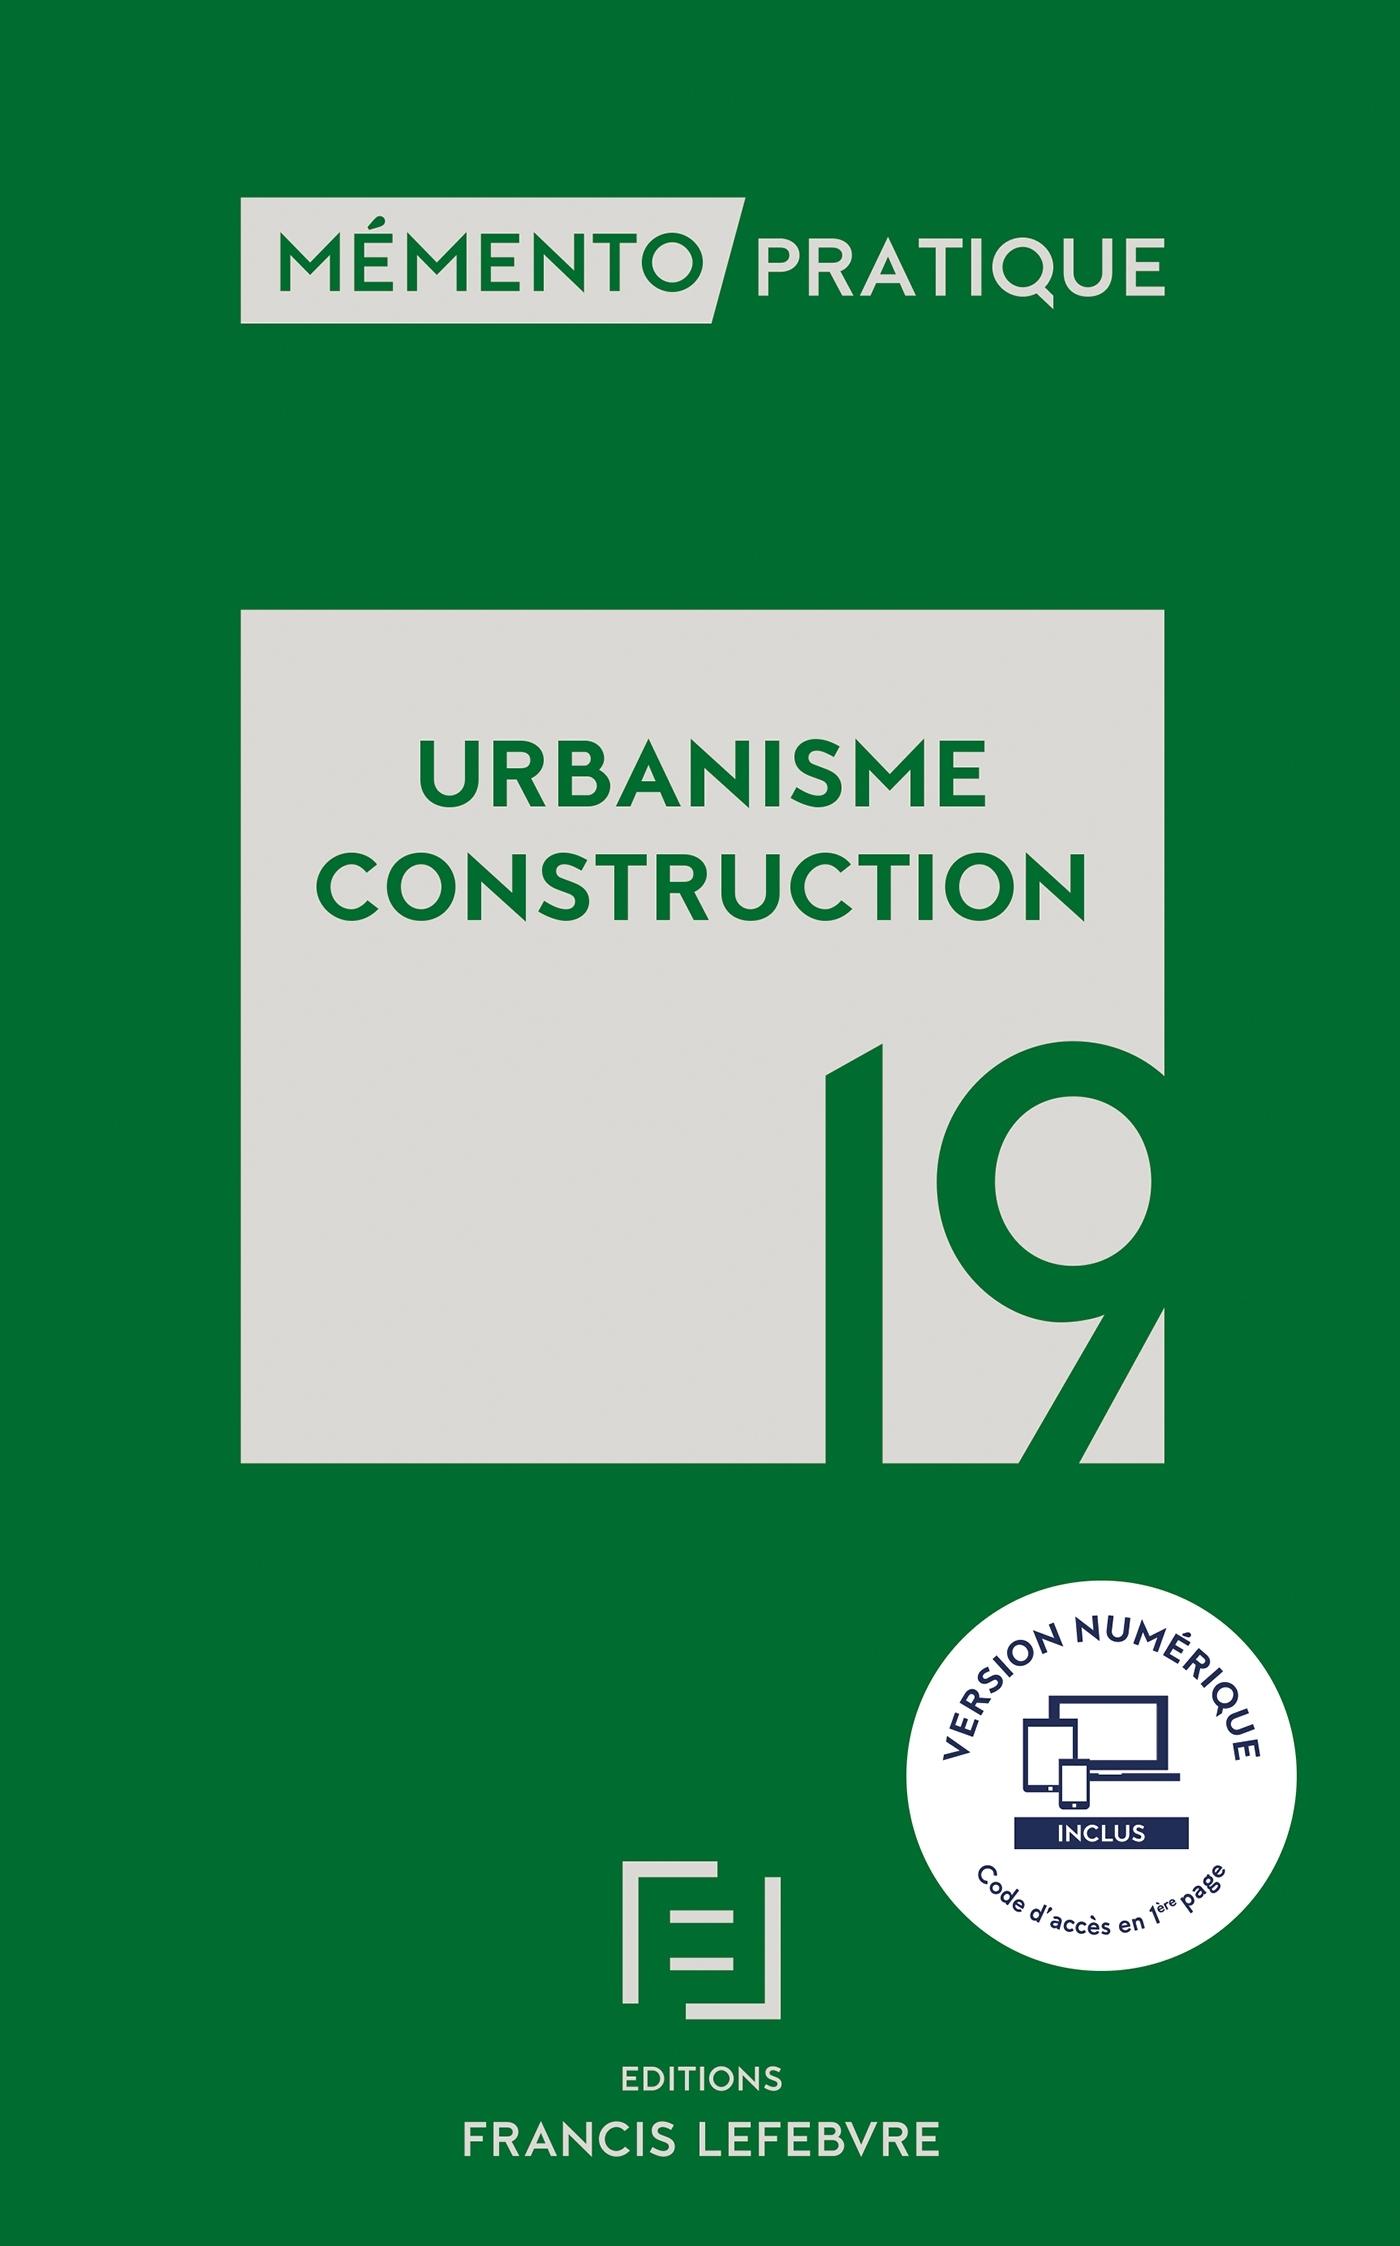 MEMENTO URBANISME CONSTRUCTION 2019